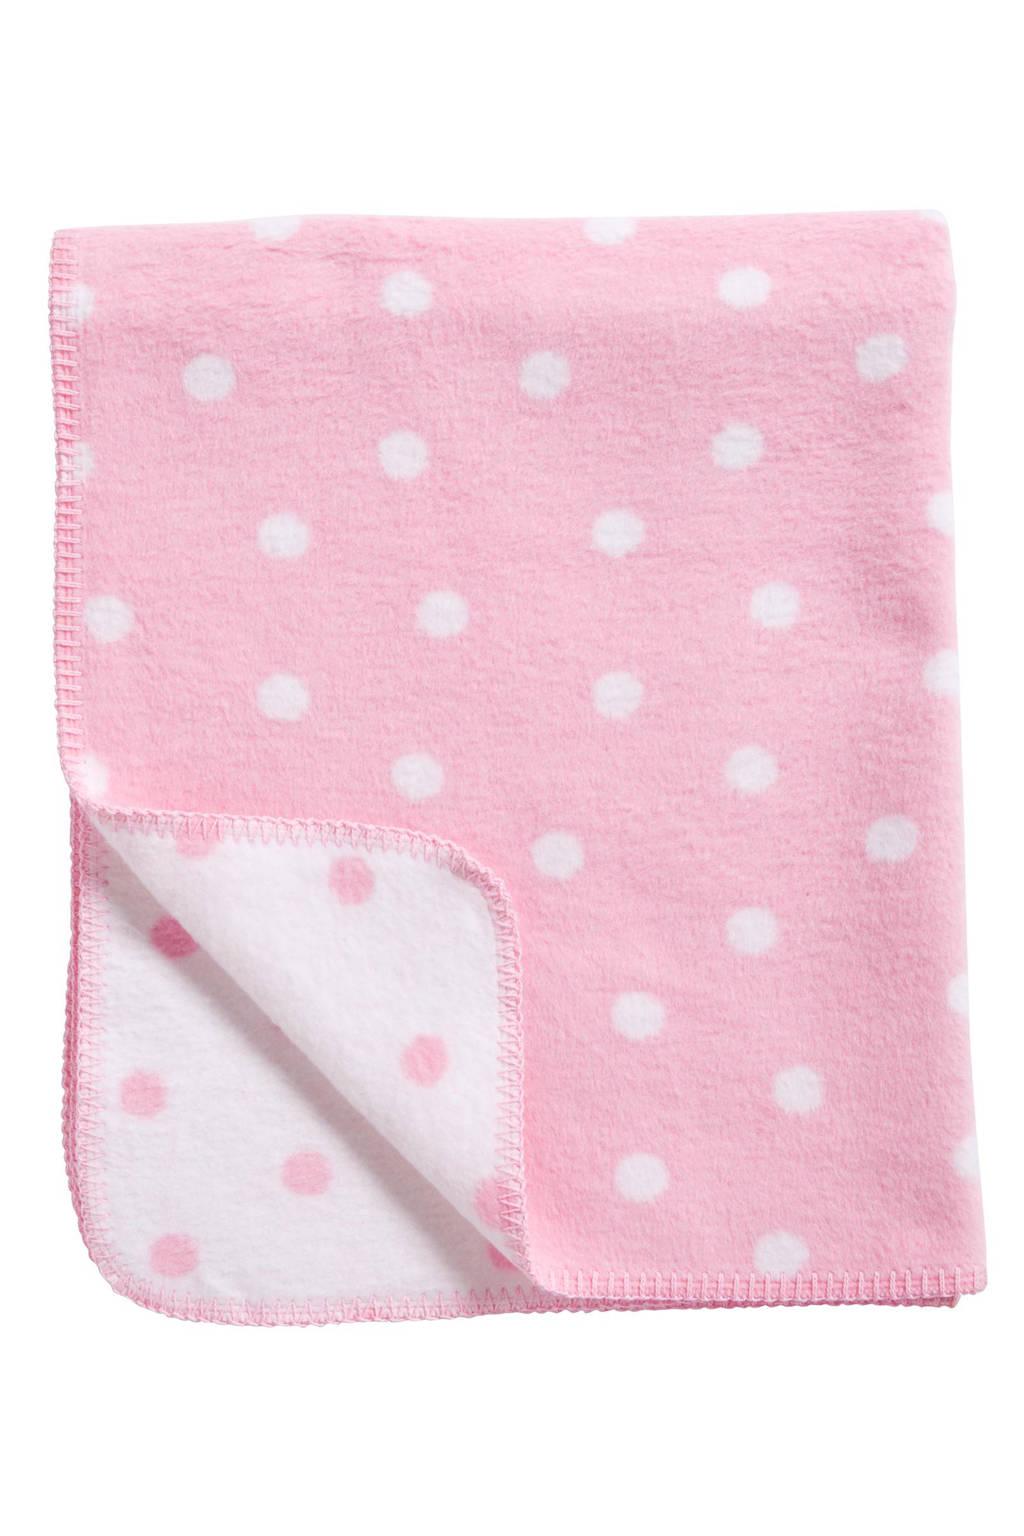 Meyco Stip ledikantdeken 100x150 cm roze/wit, Roze/wit